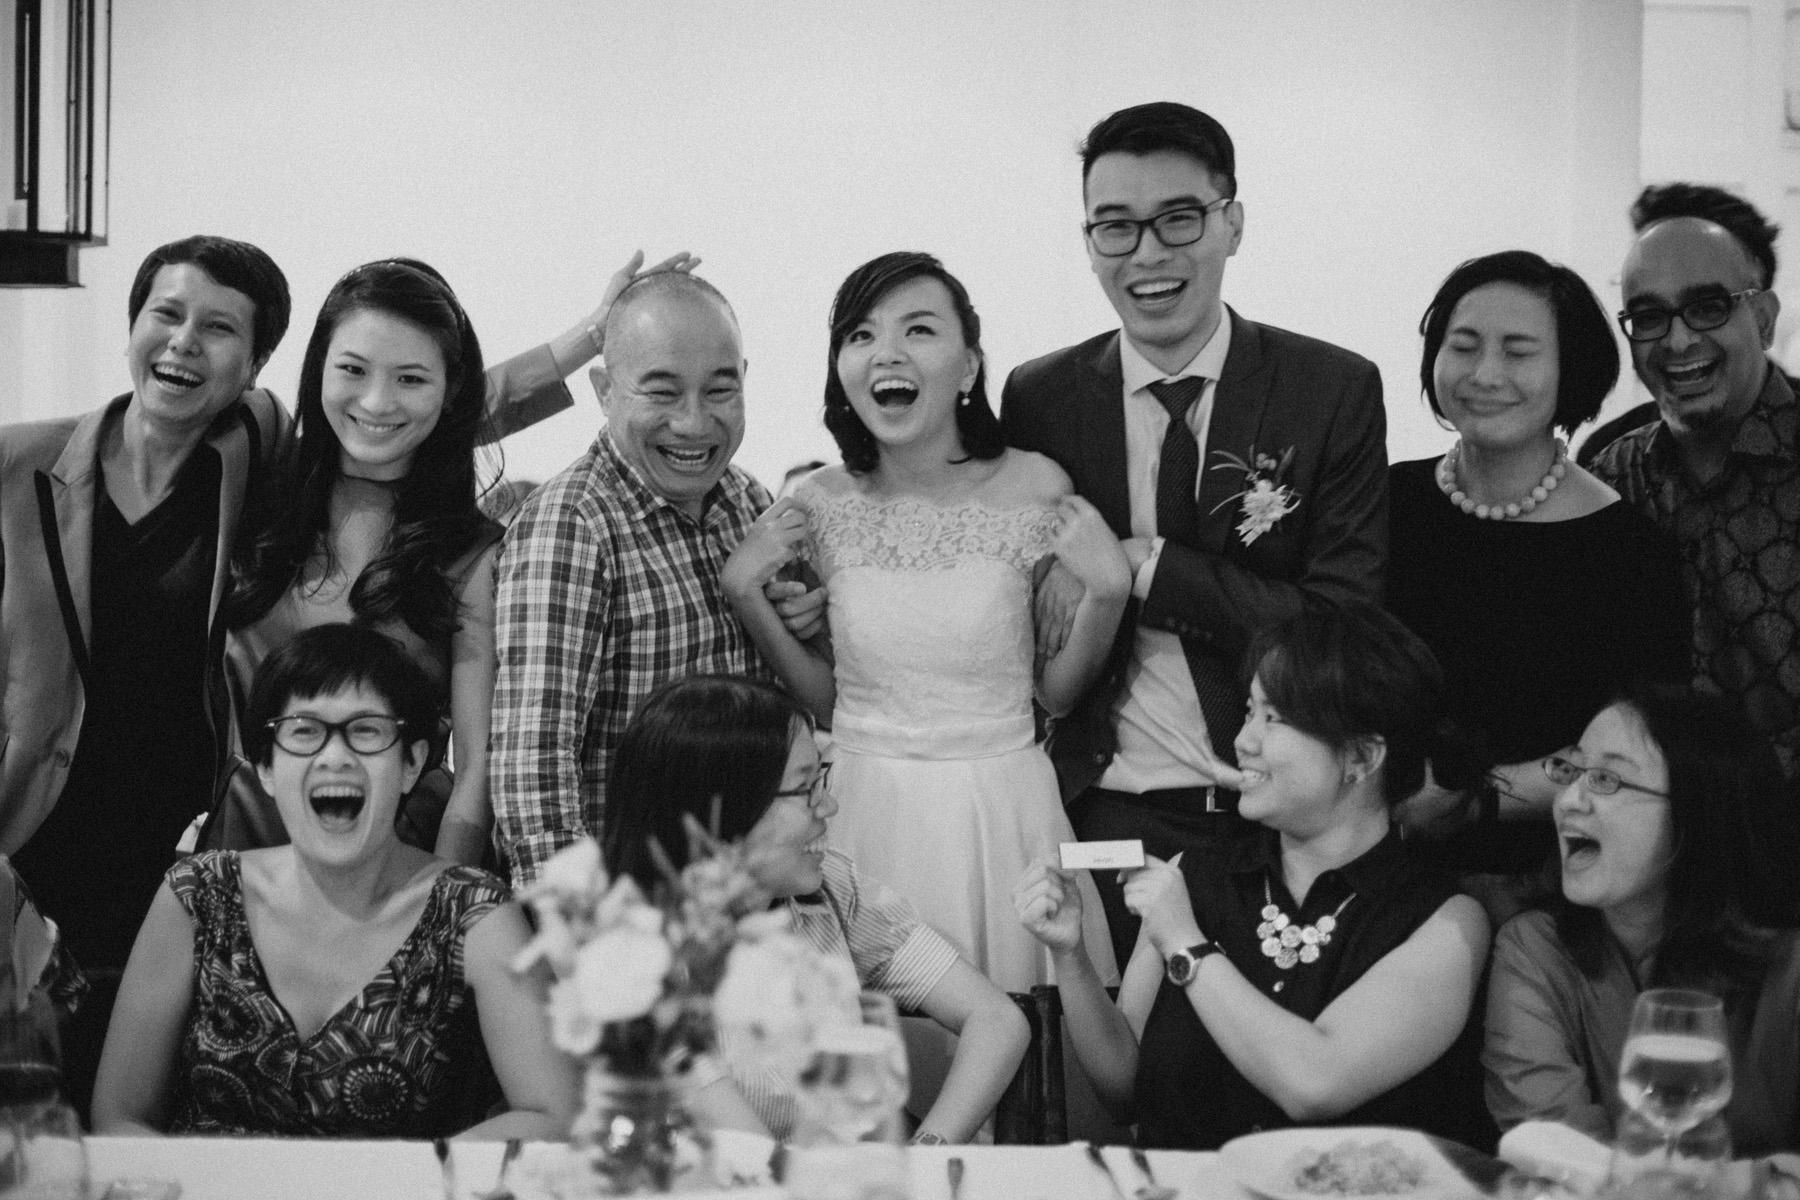 singapore-wedding-travel-photographer-faith-alvin-wedding-wmt-59.jpg